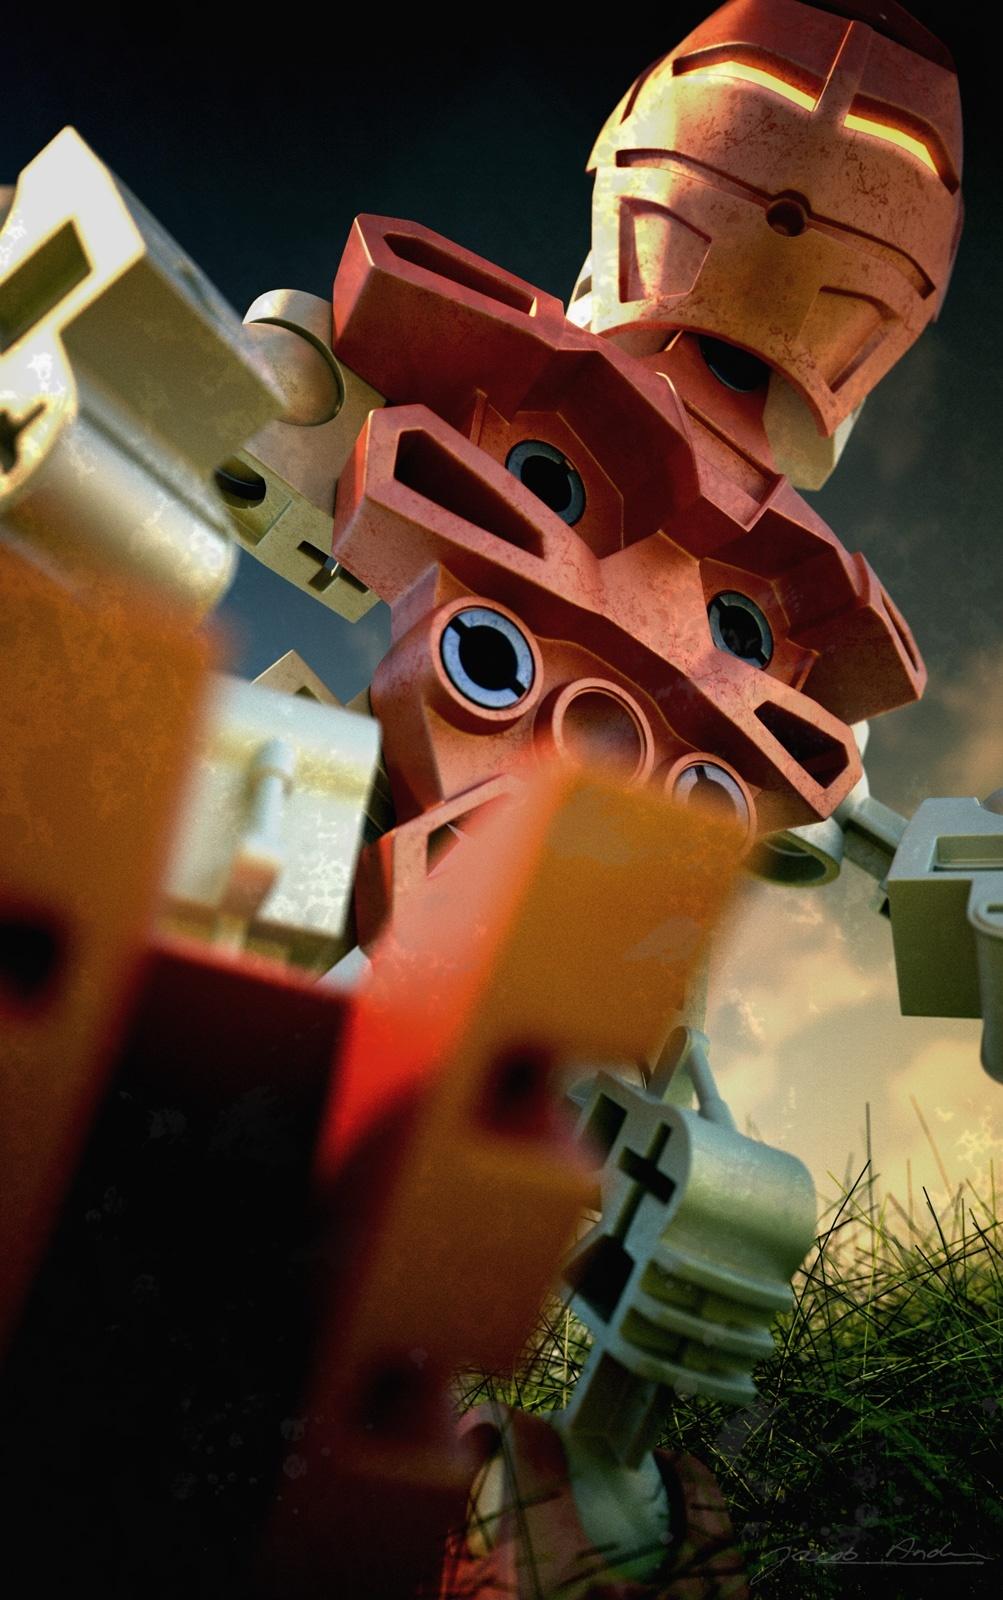 Profusion bionicle v3 dot 0 1 42ac2837 cmd4